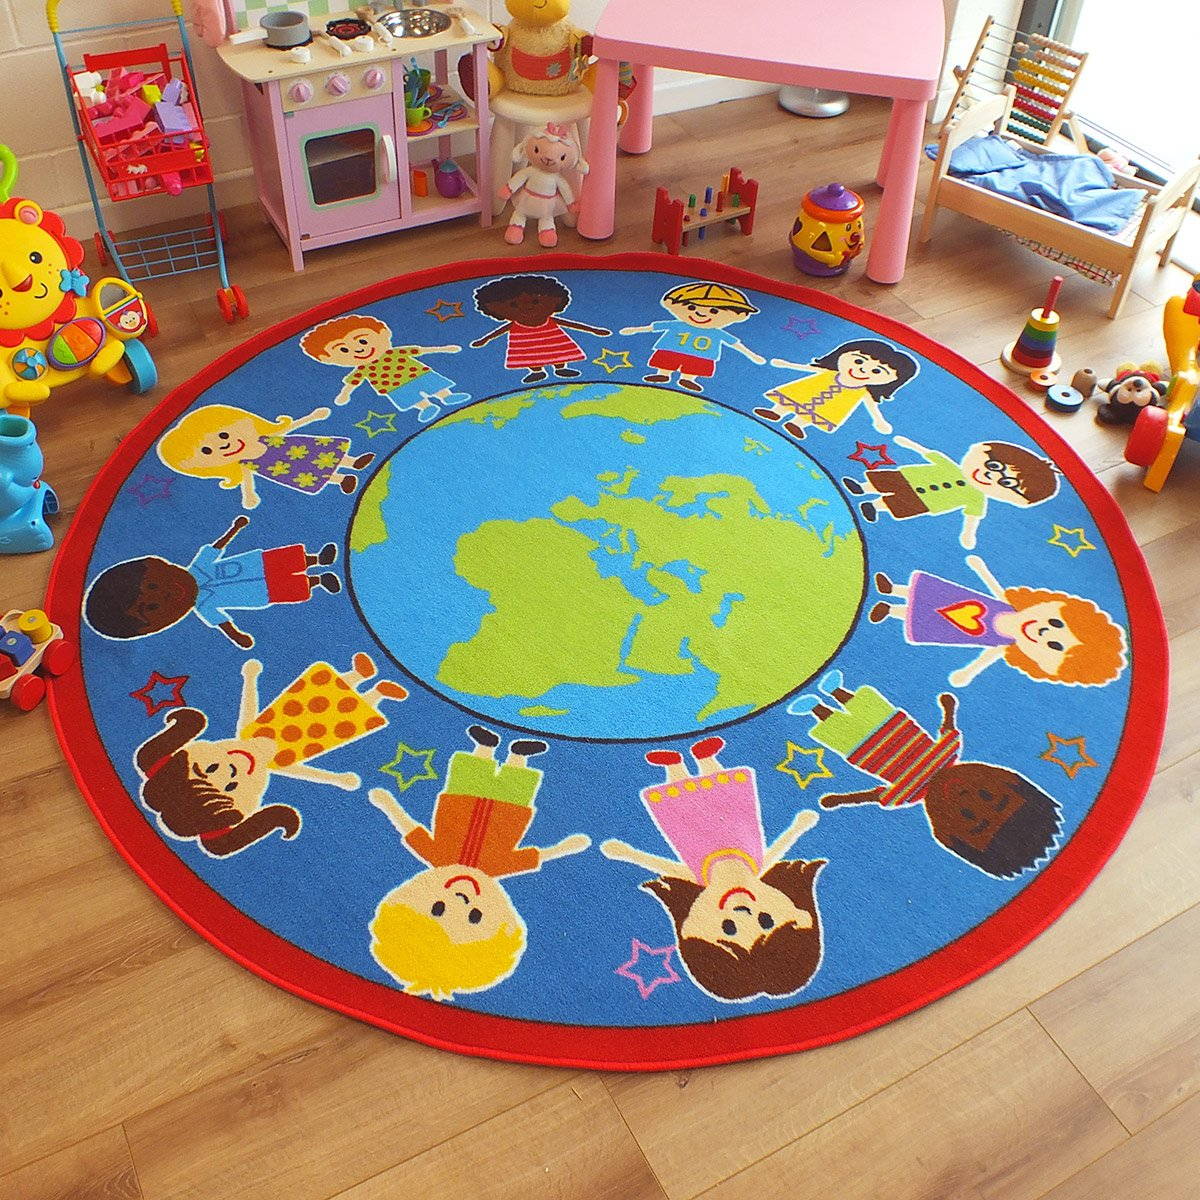 Superb Bright Kids Childs Rug Children Of The World Globe Large